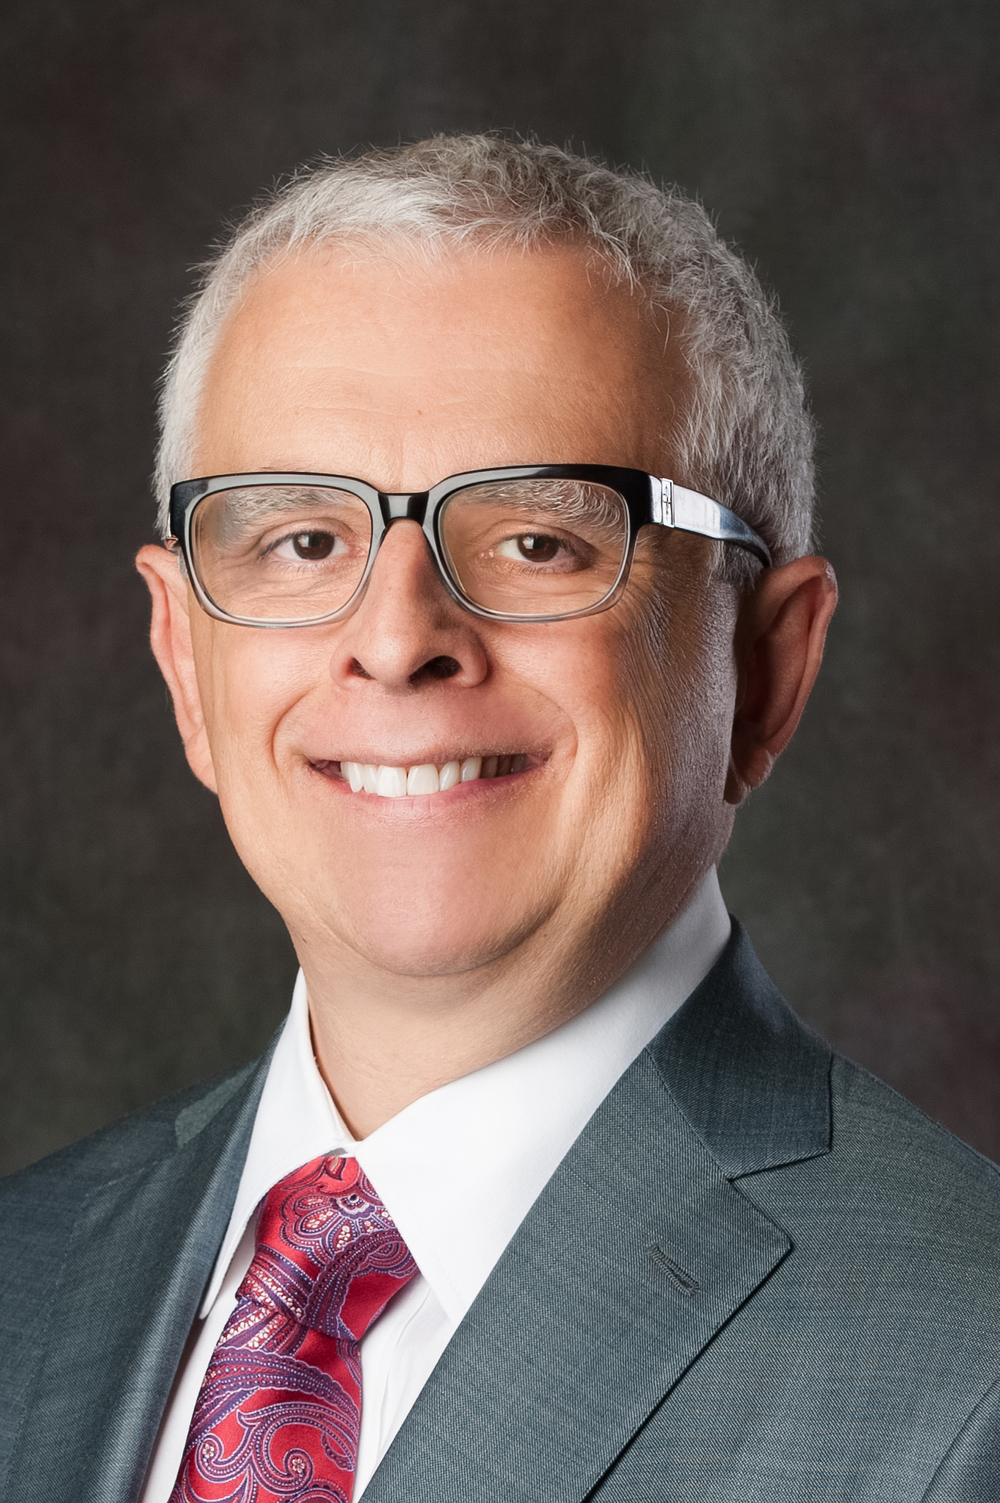 Dr. John Katopodis